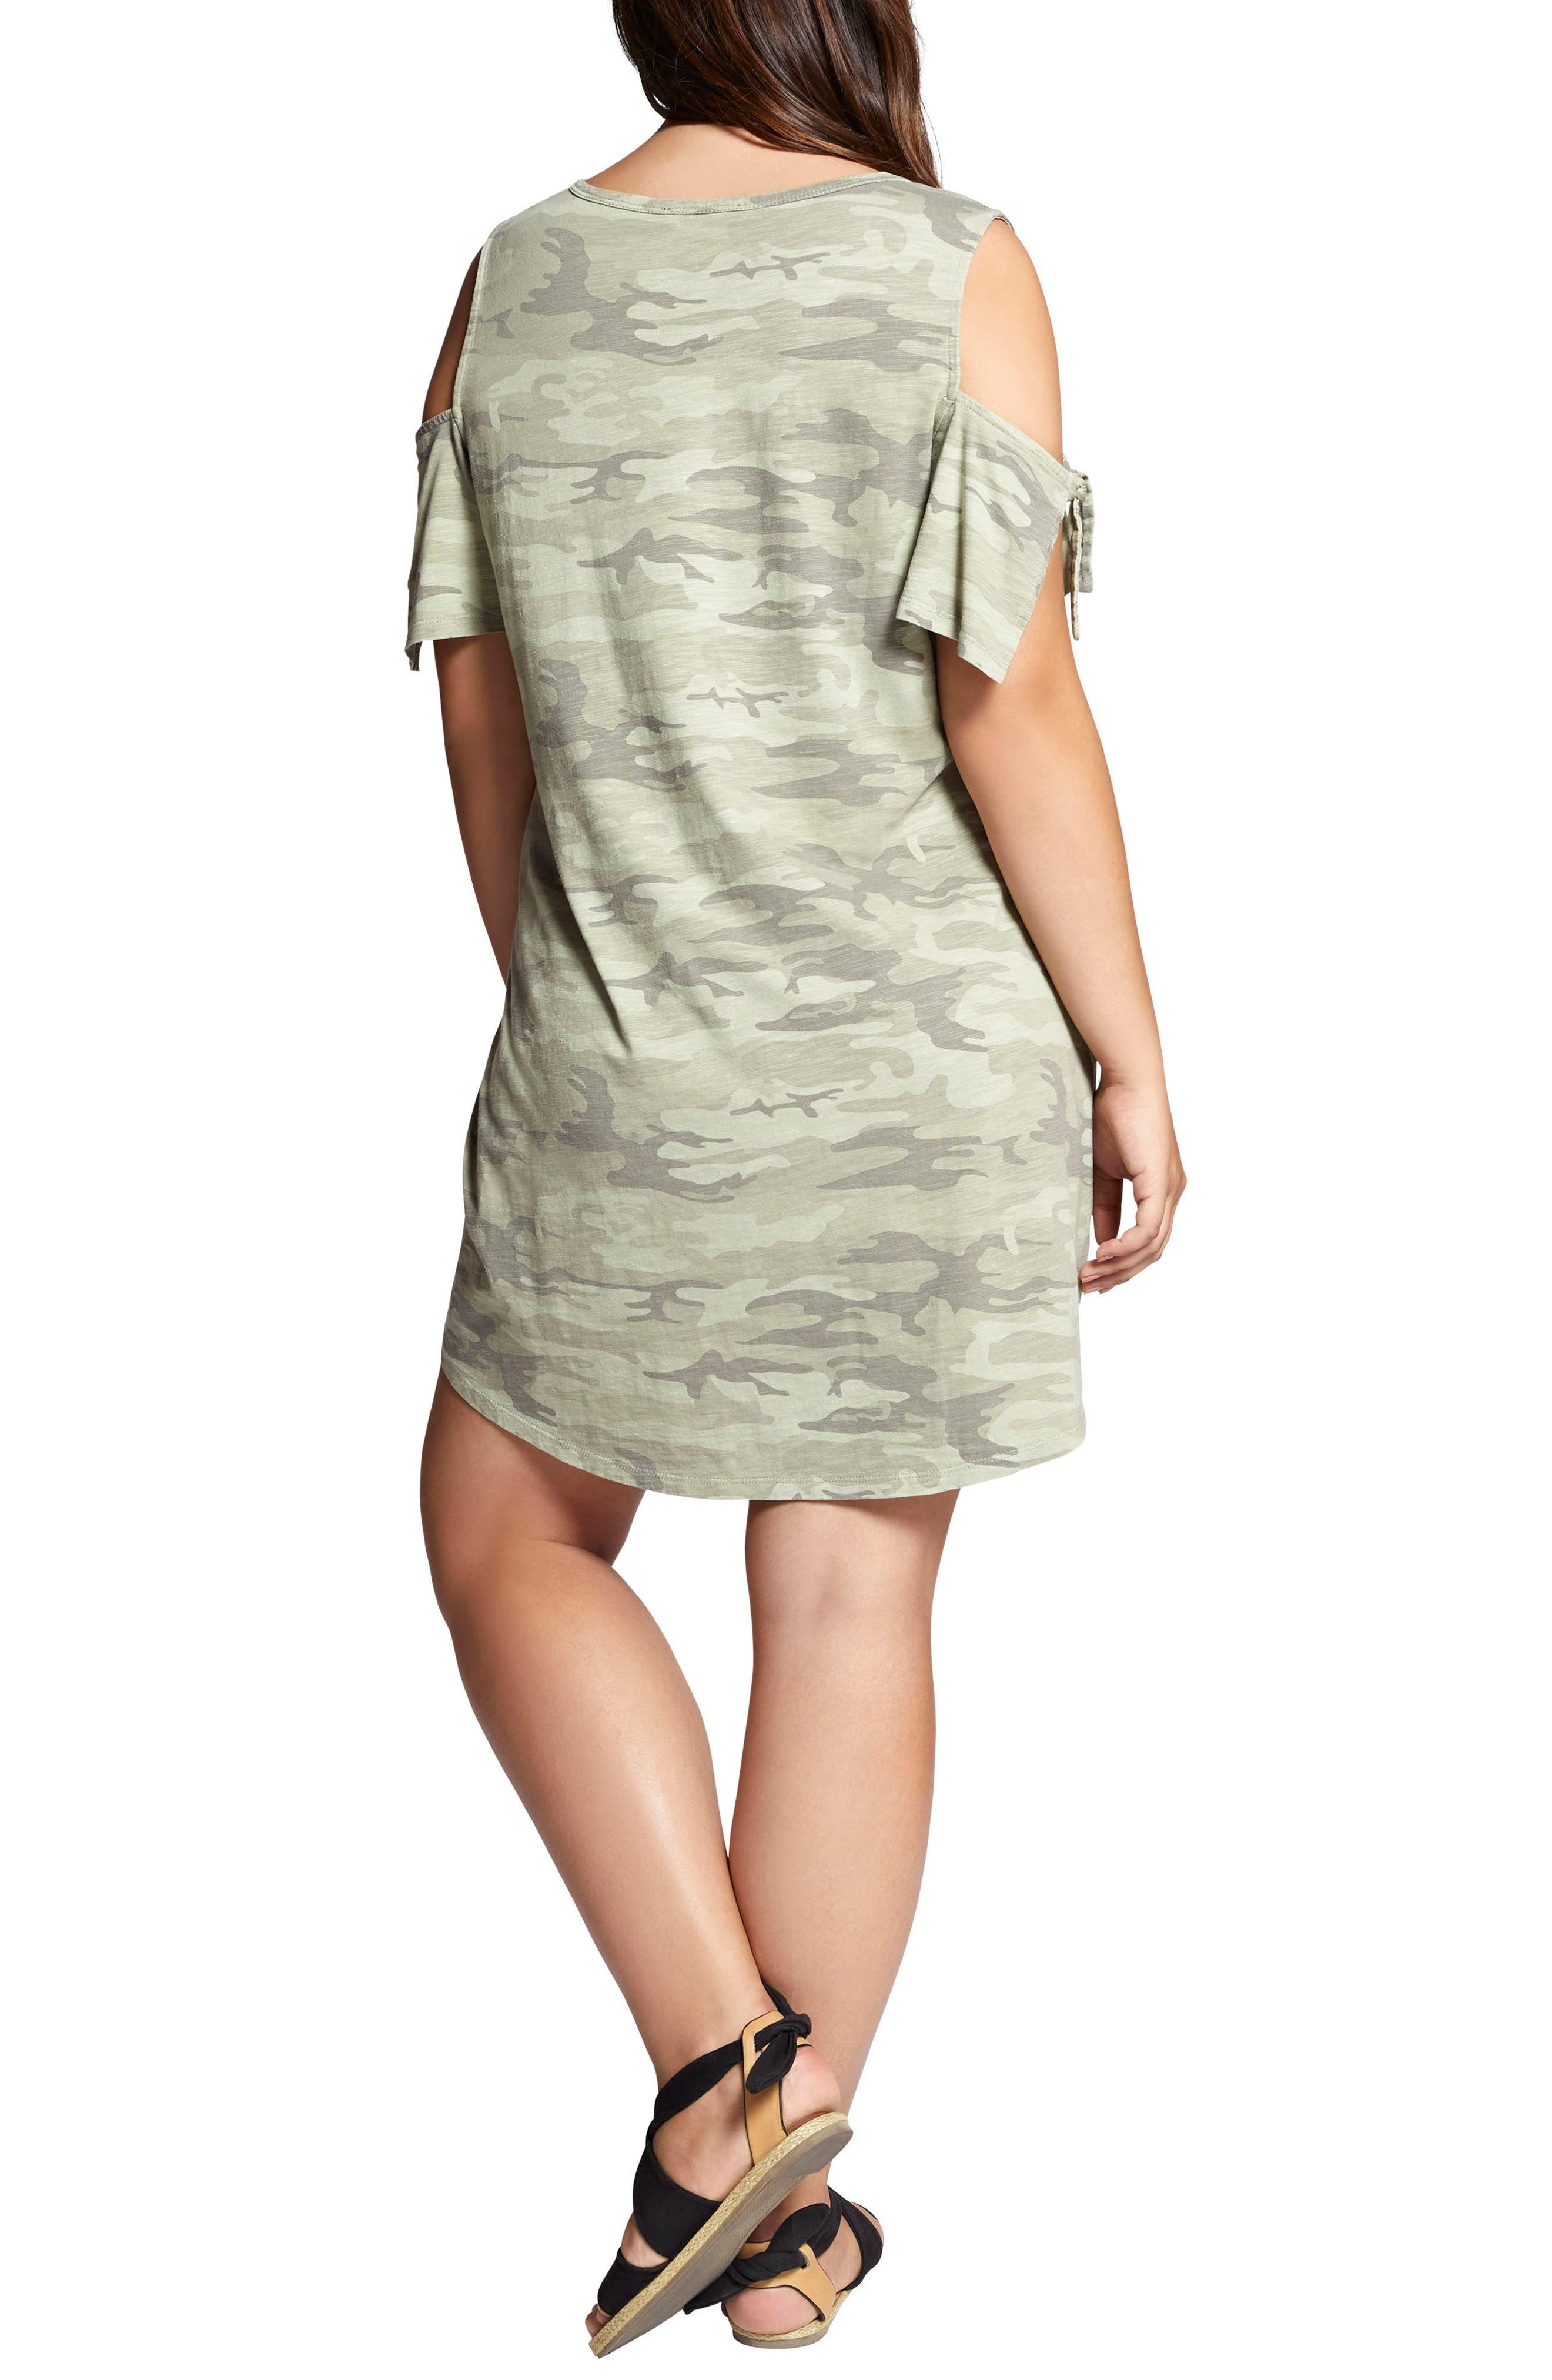 Lakeside Camo Cold Shoulder T-Shirt Dress,                             Alternate thumbnail 2, color,                             CADET CAMO